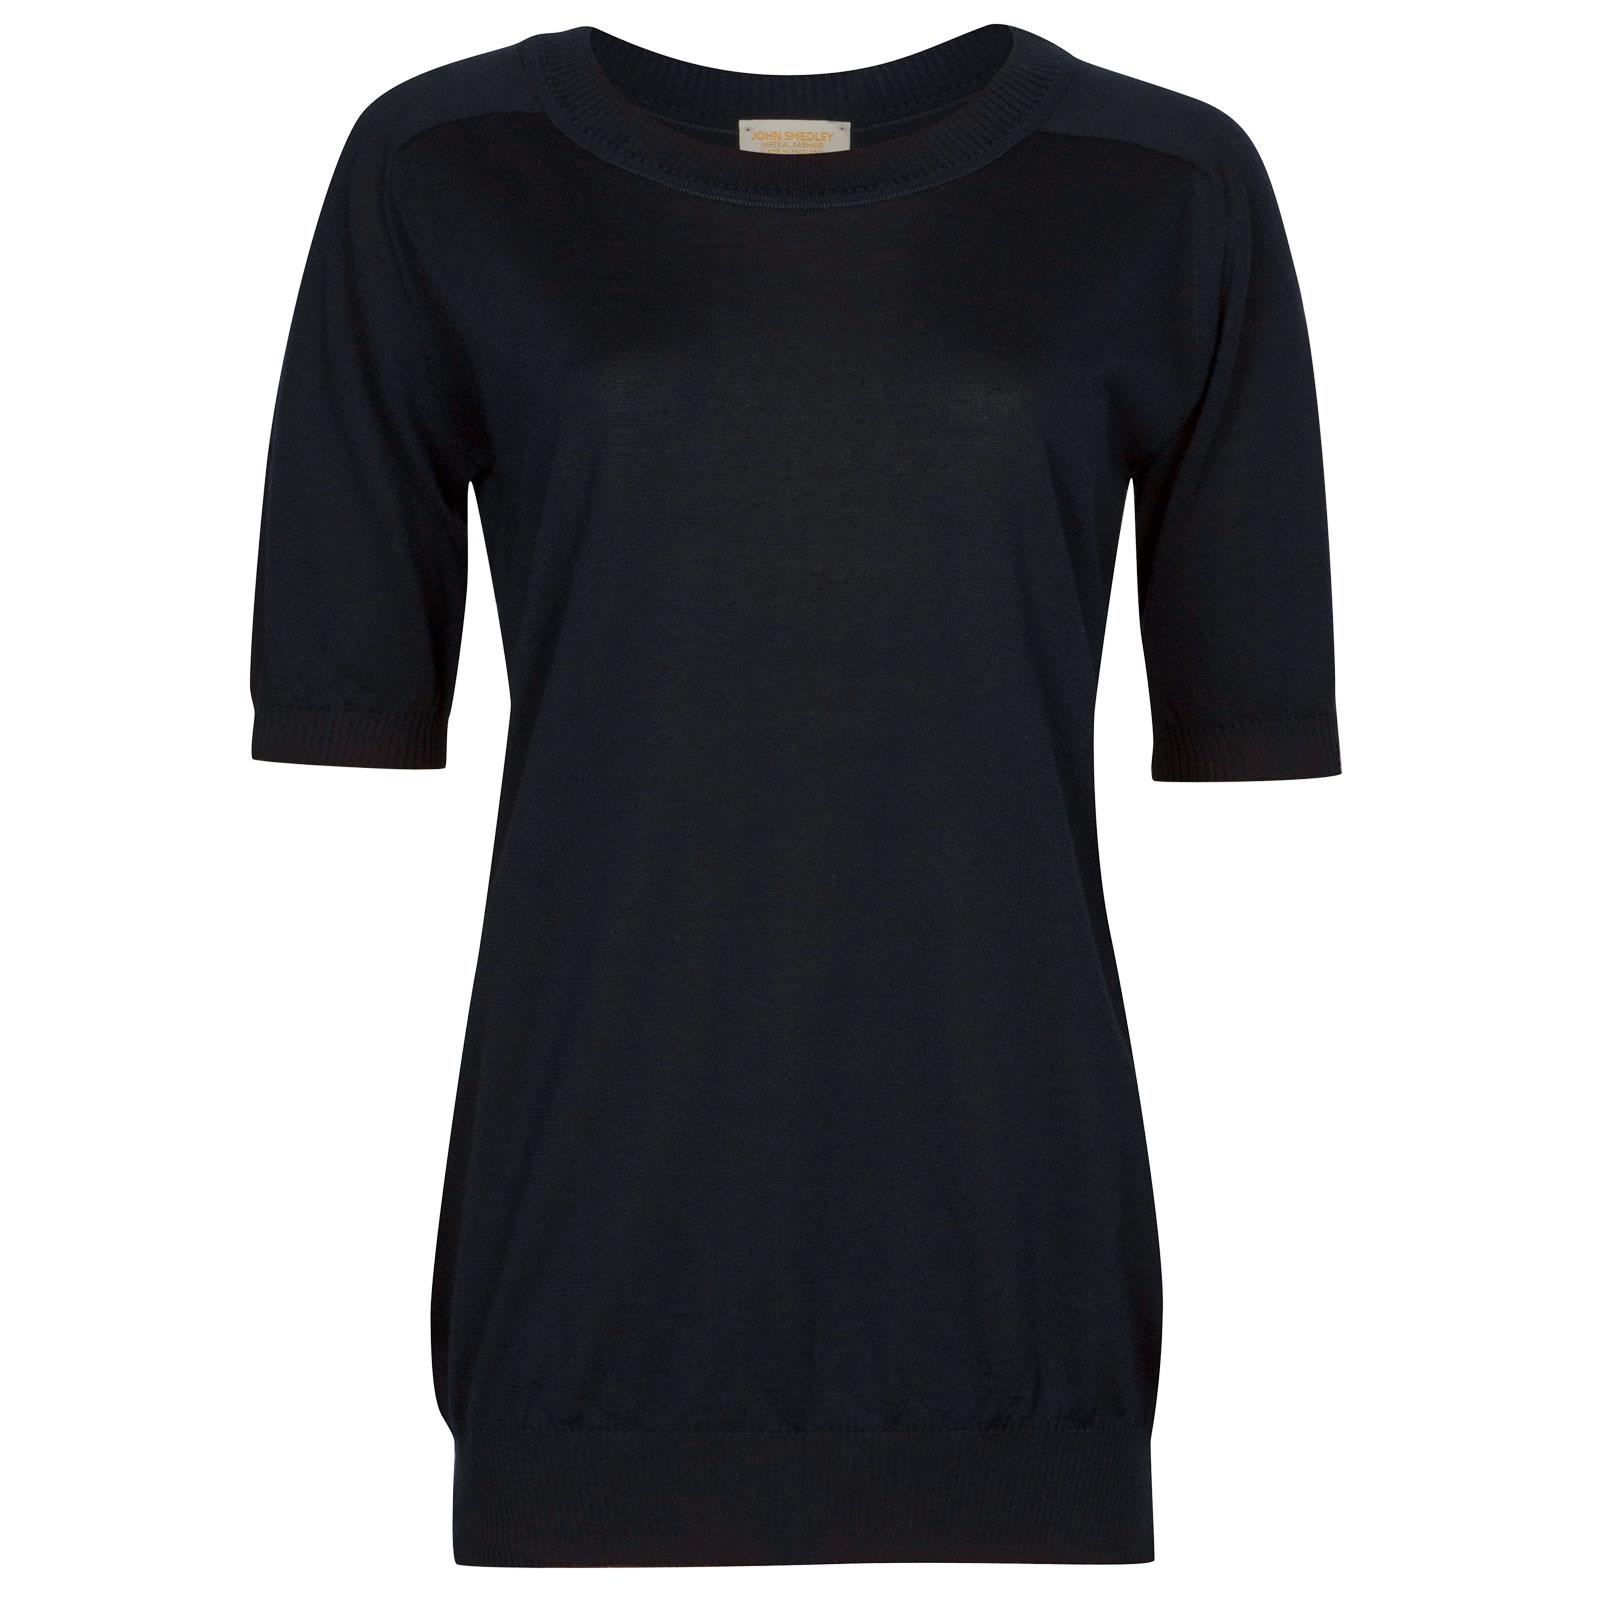 John Smedley Austen in Midnight T-Shirt-LGE